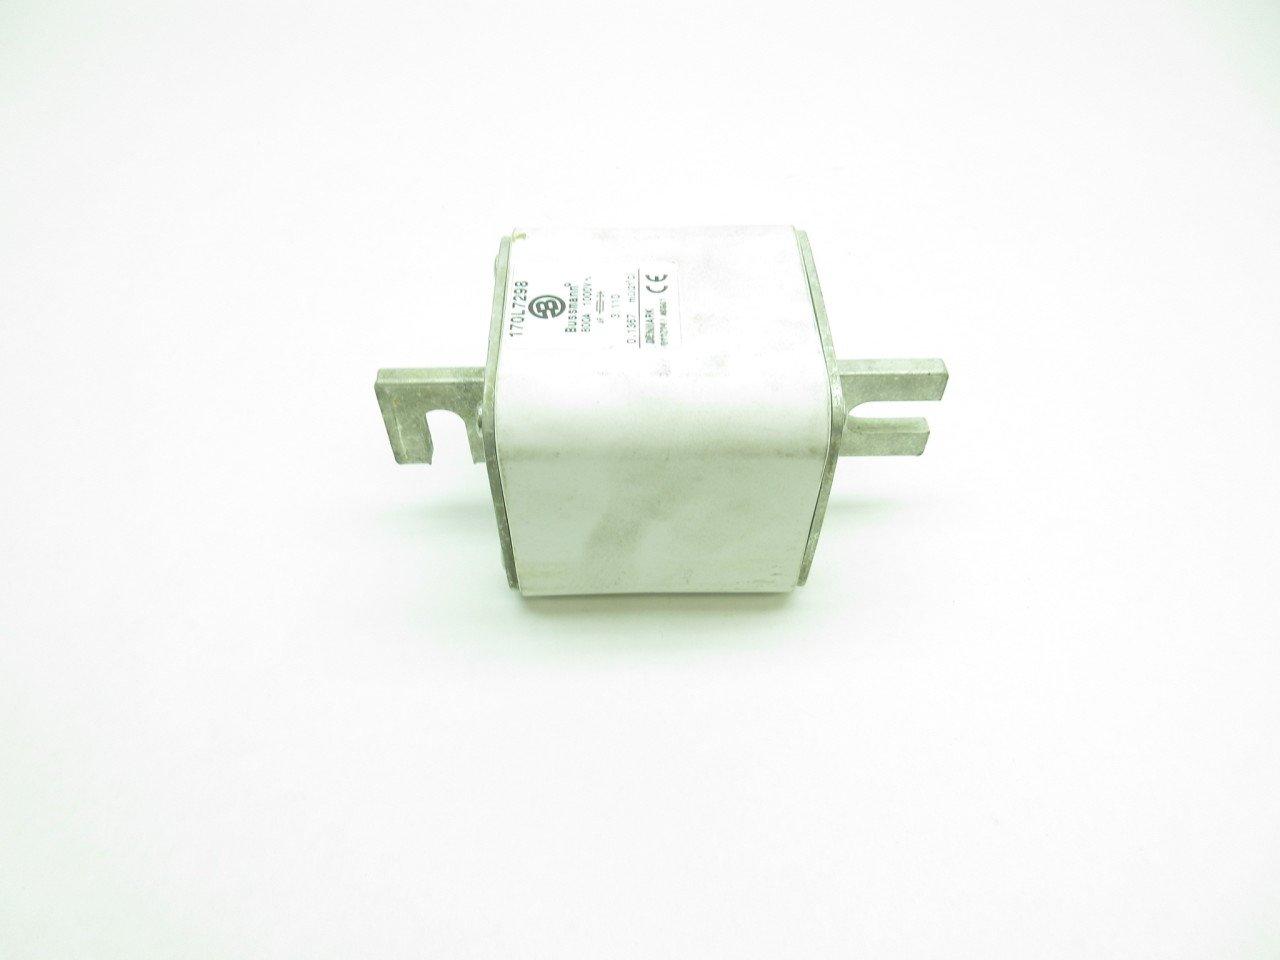 NEW COOPER BUSSMANN 170L7298 FUSE 800A AMP 1000V-AC D586029